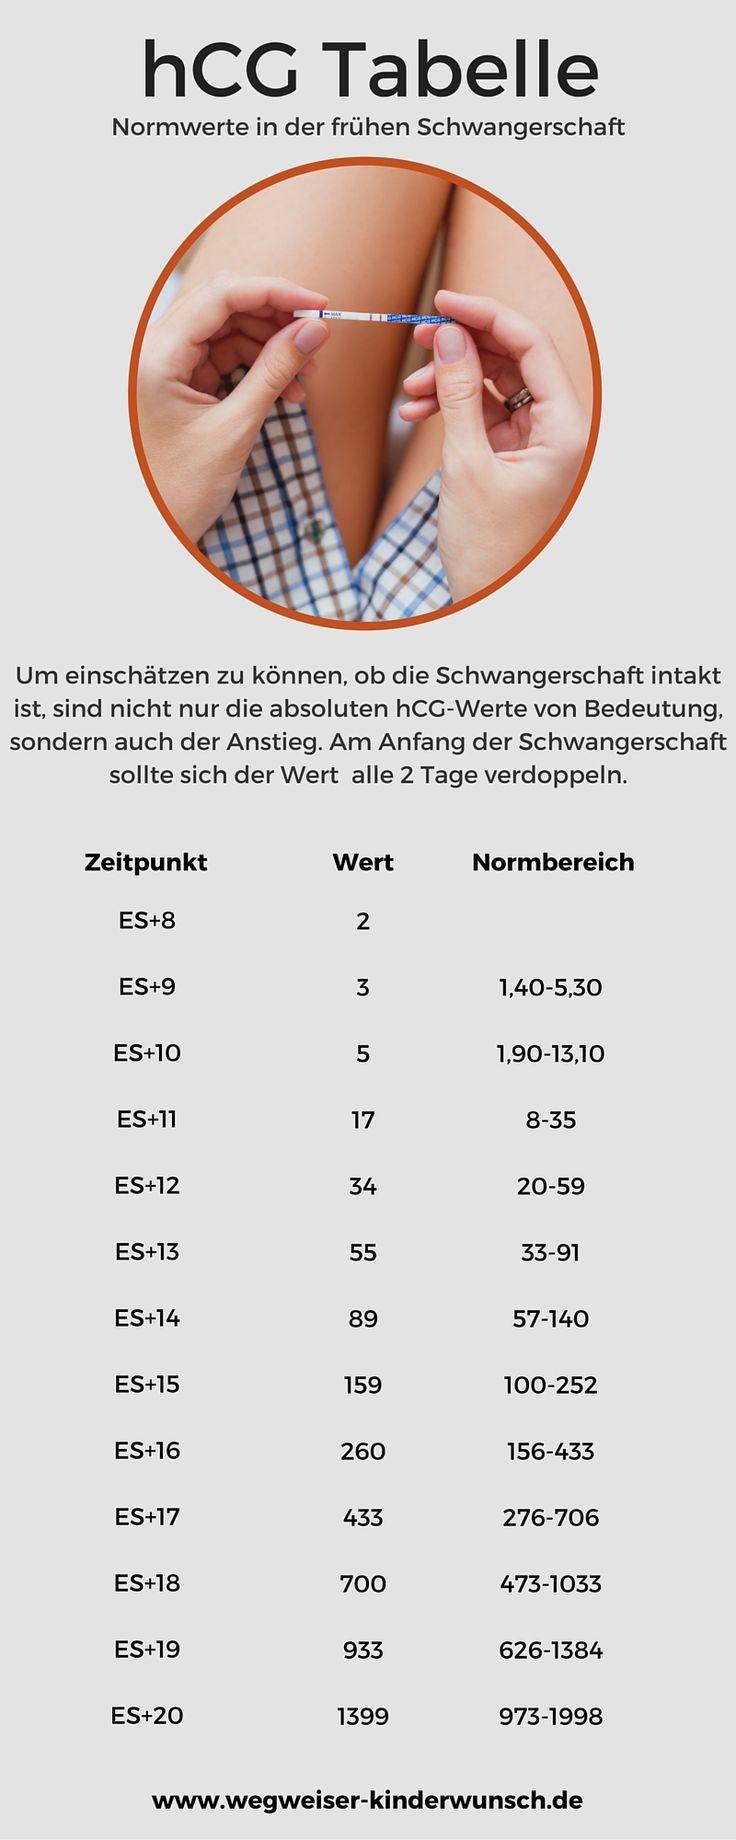 hcg tabelle normwerte in der fr hen schwangerschaft tipps kinderwunsch pinterest tabelle. Black Bedroom Furniture Sets. Home Design Ideas